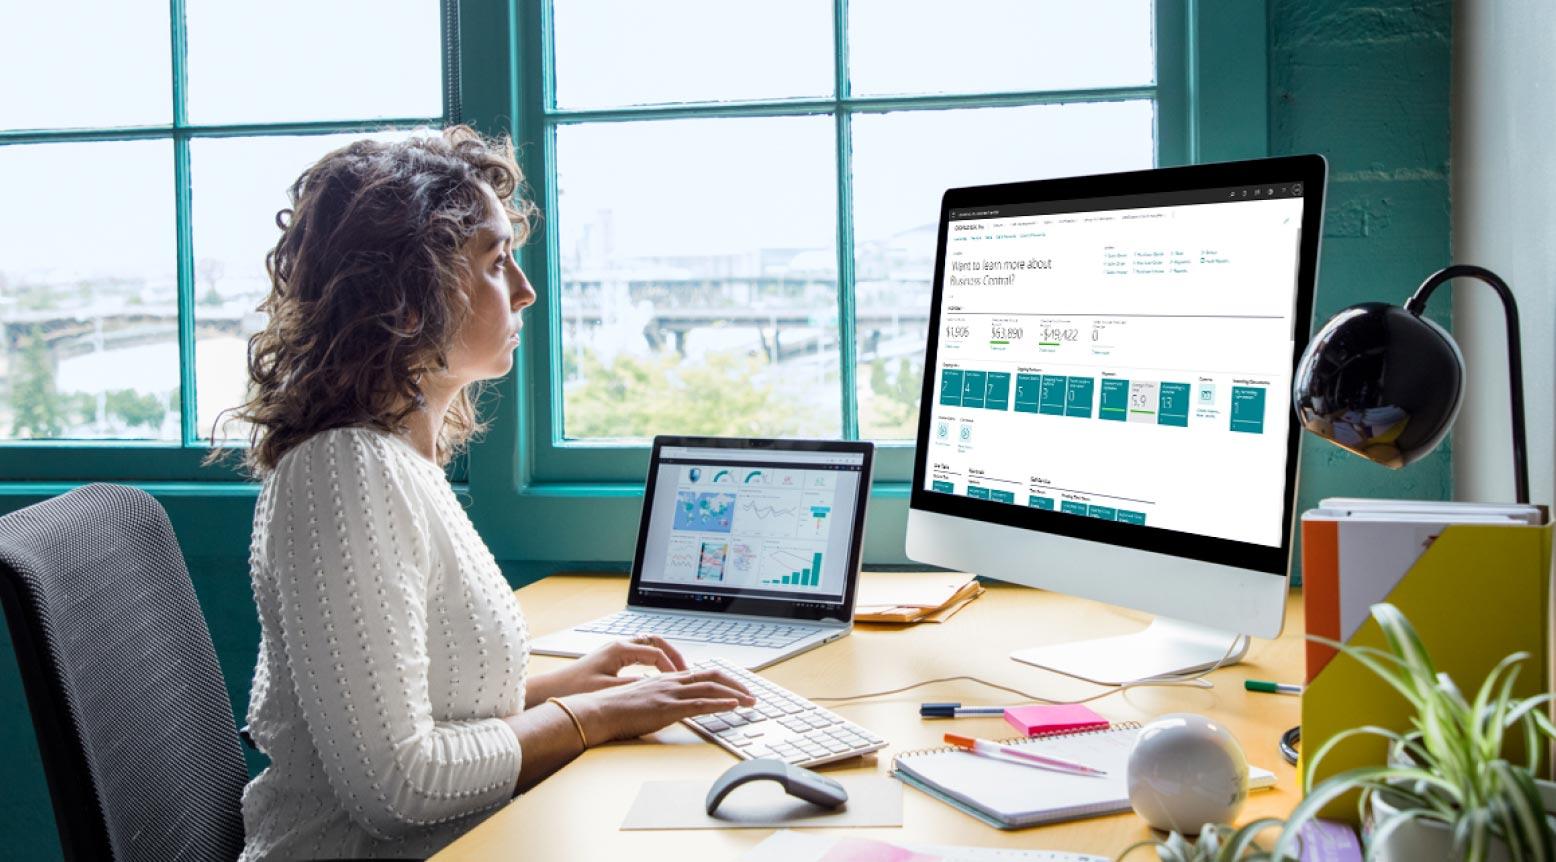 Microsoft lansează Dynamics 365 Business Central pe piața din România